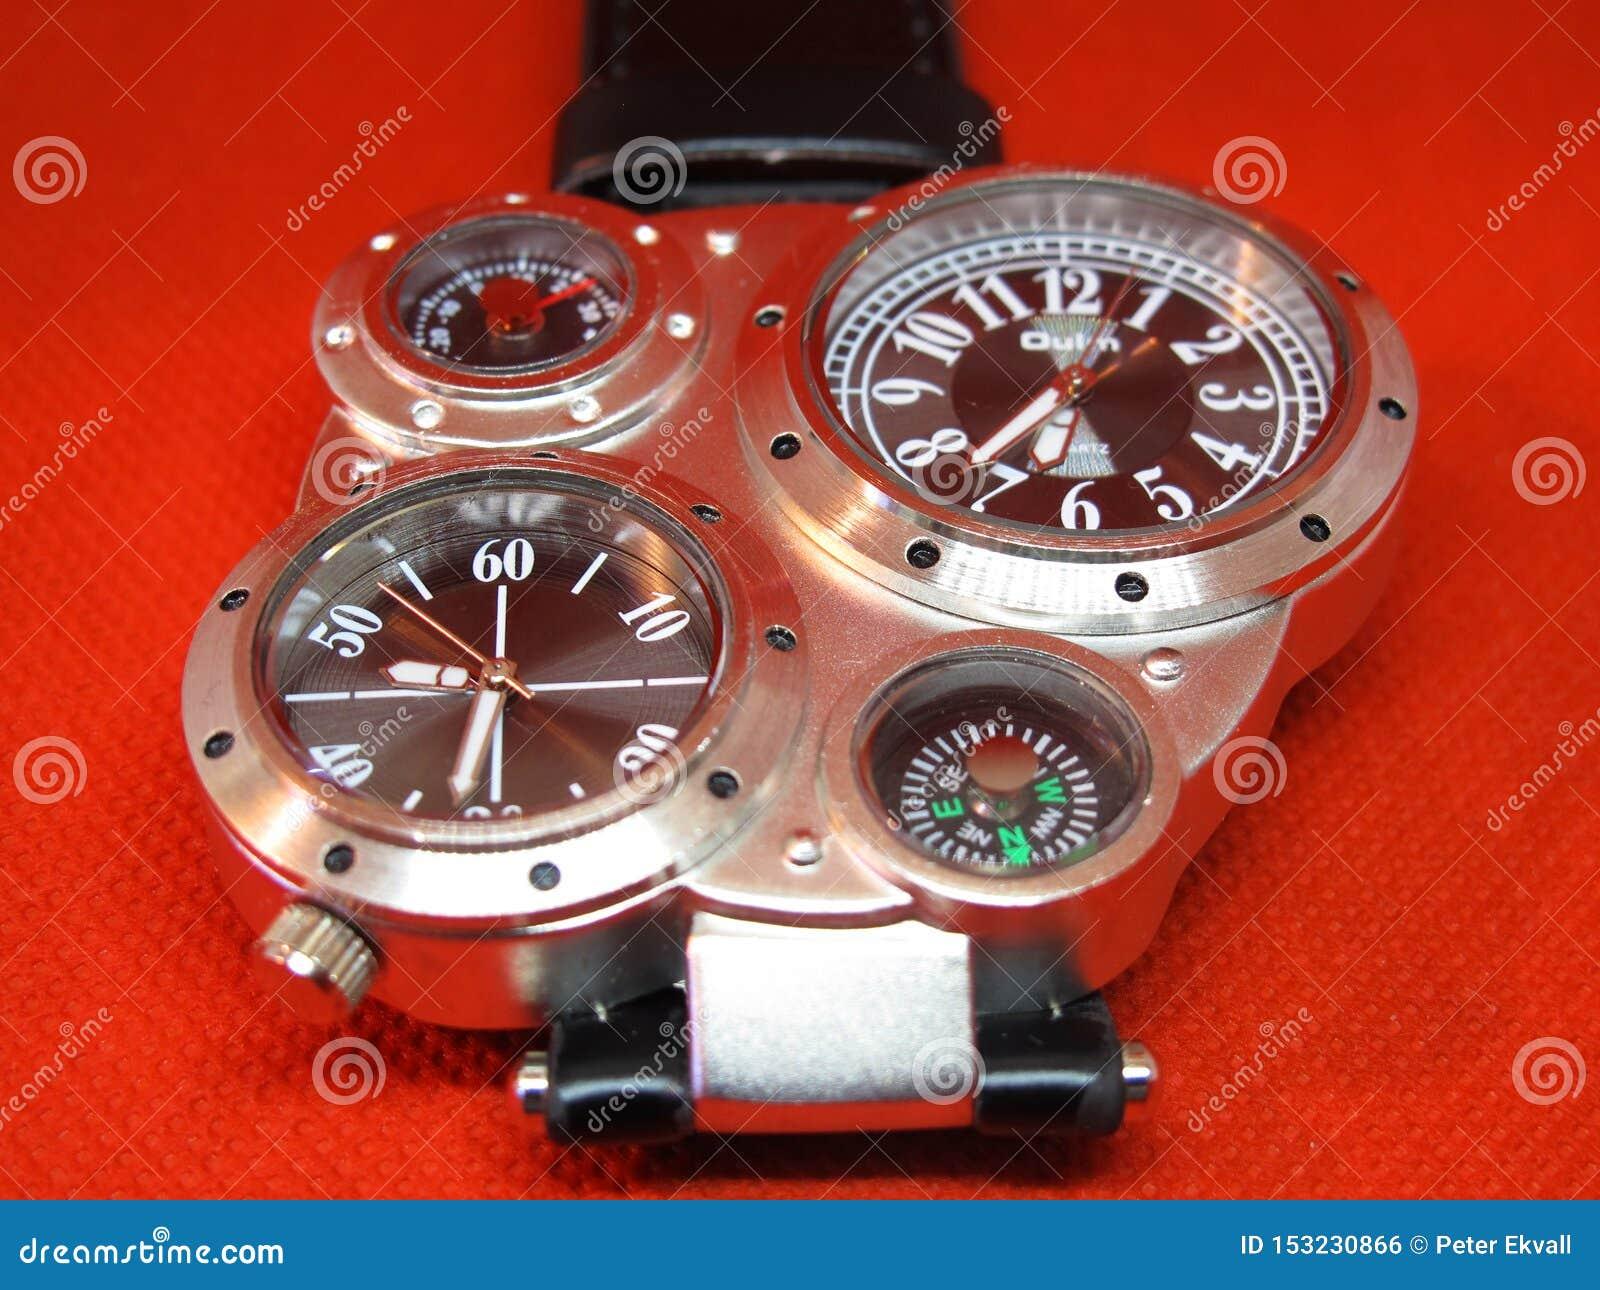 Fun and advanced wristwatch in studio